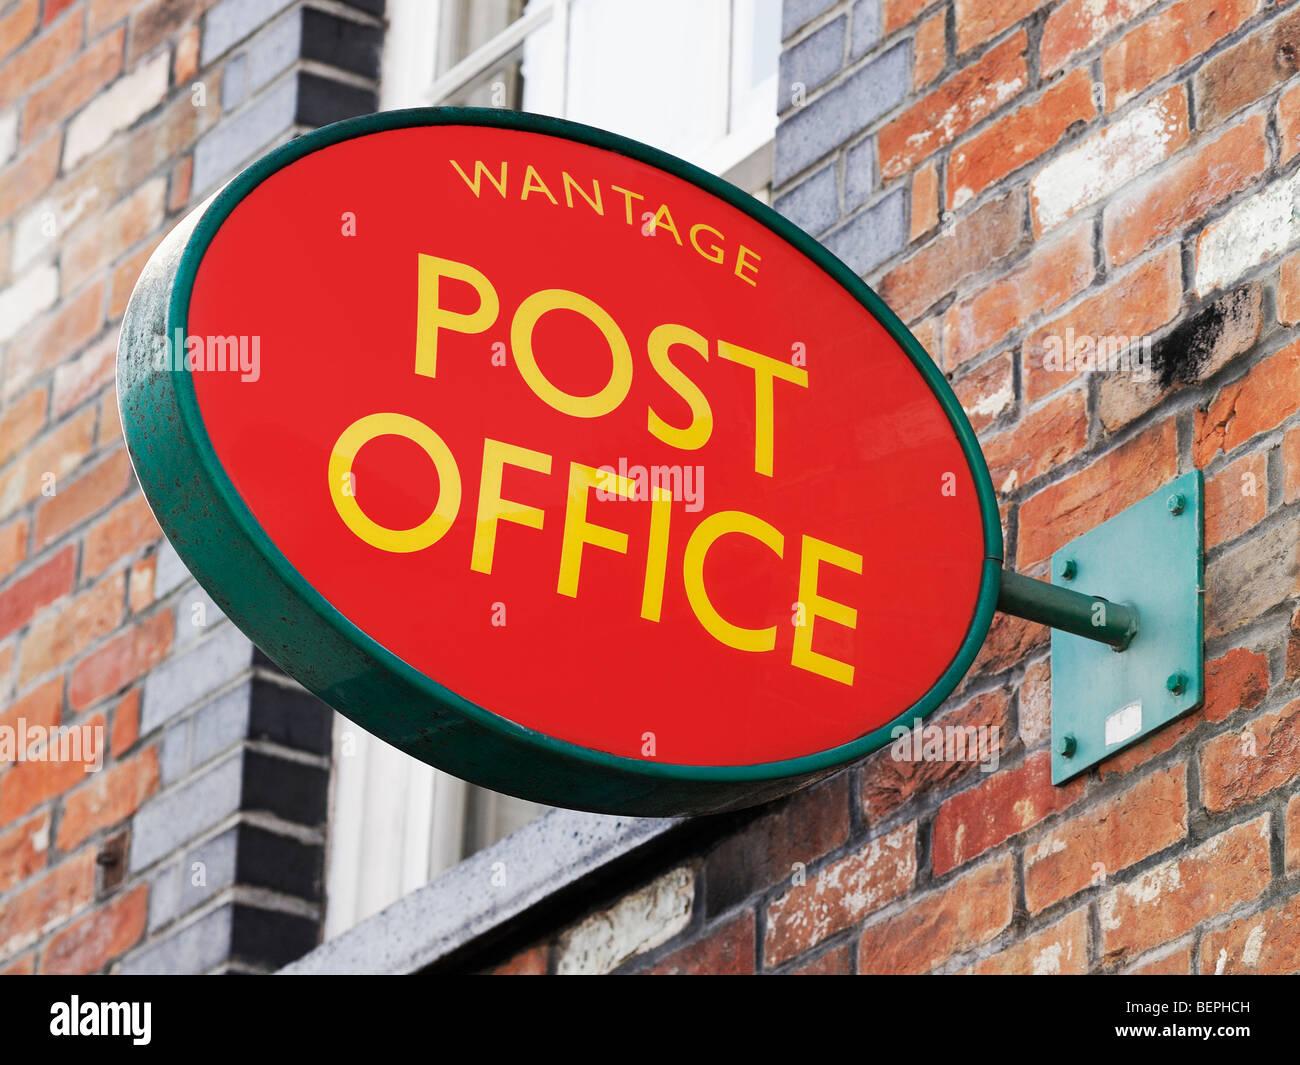 Post Office Sign, Close Up, Wantage, Oxfordshire, England, UK. - Stock Image